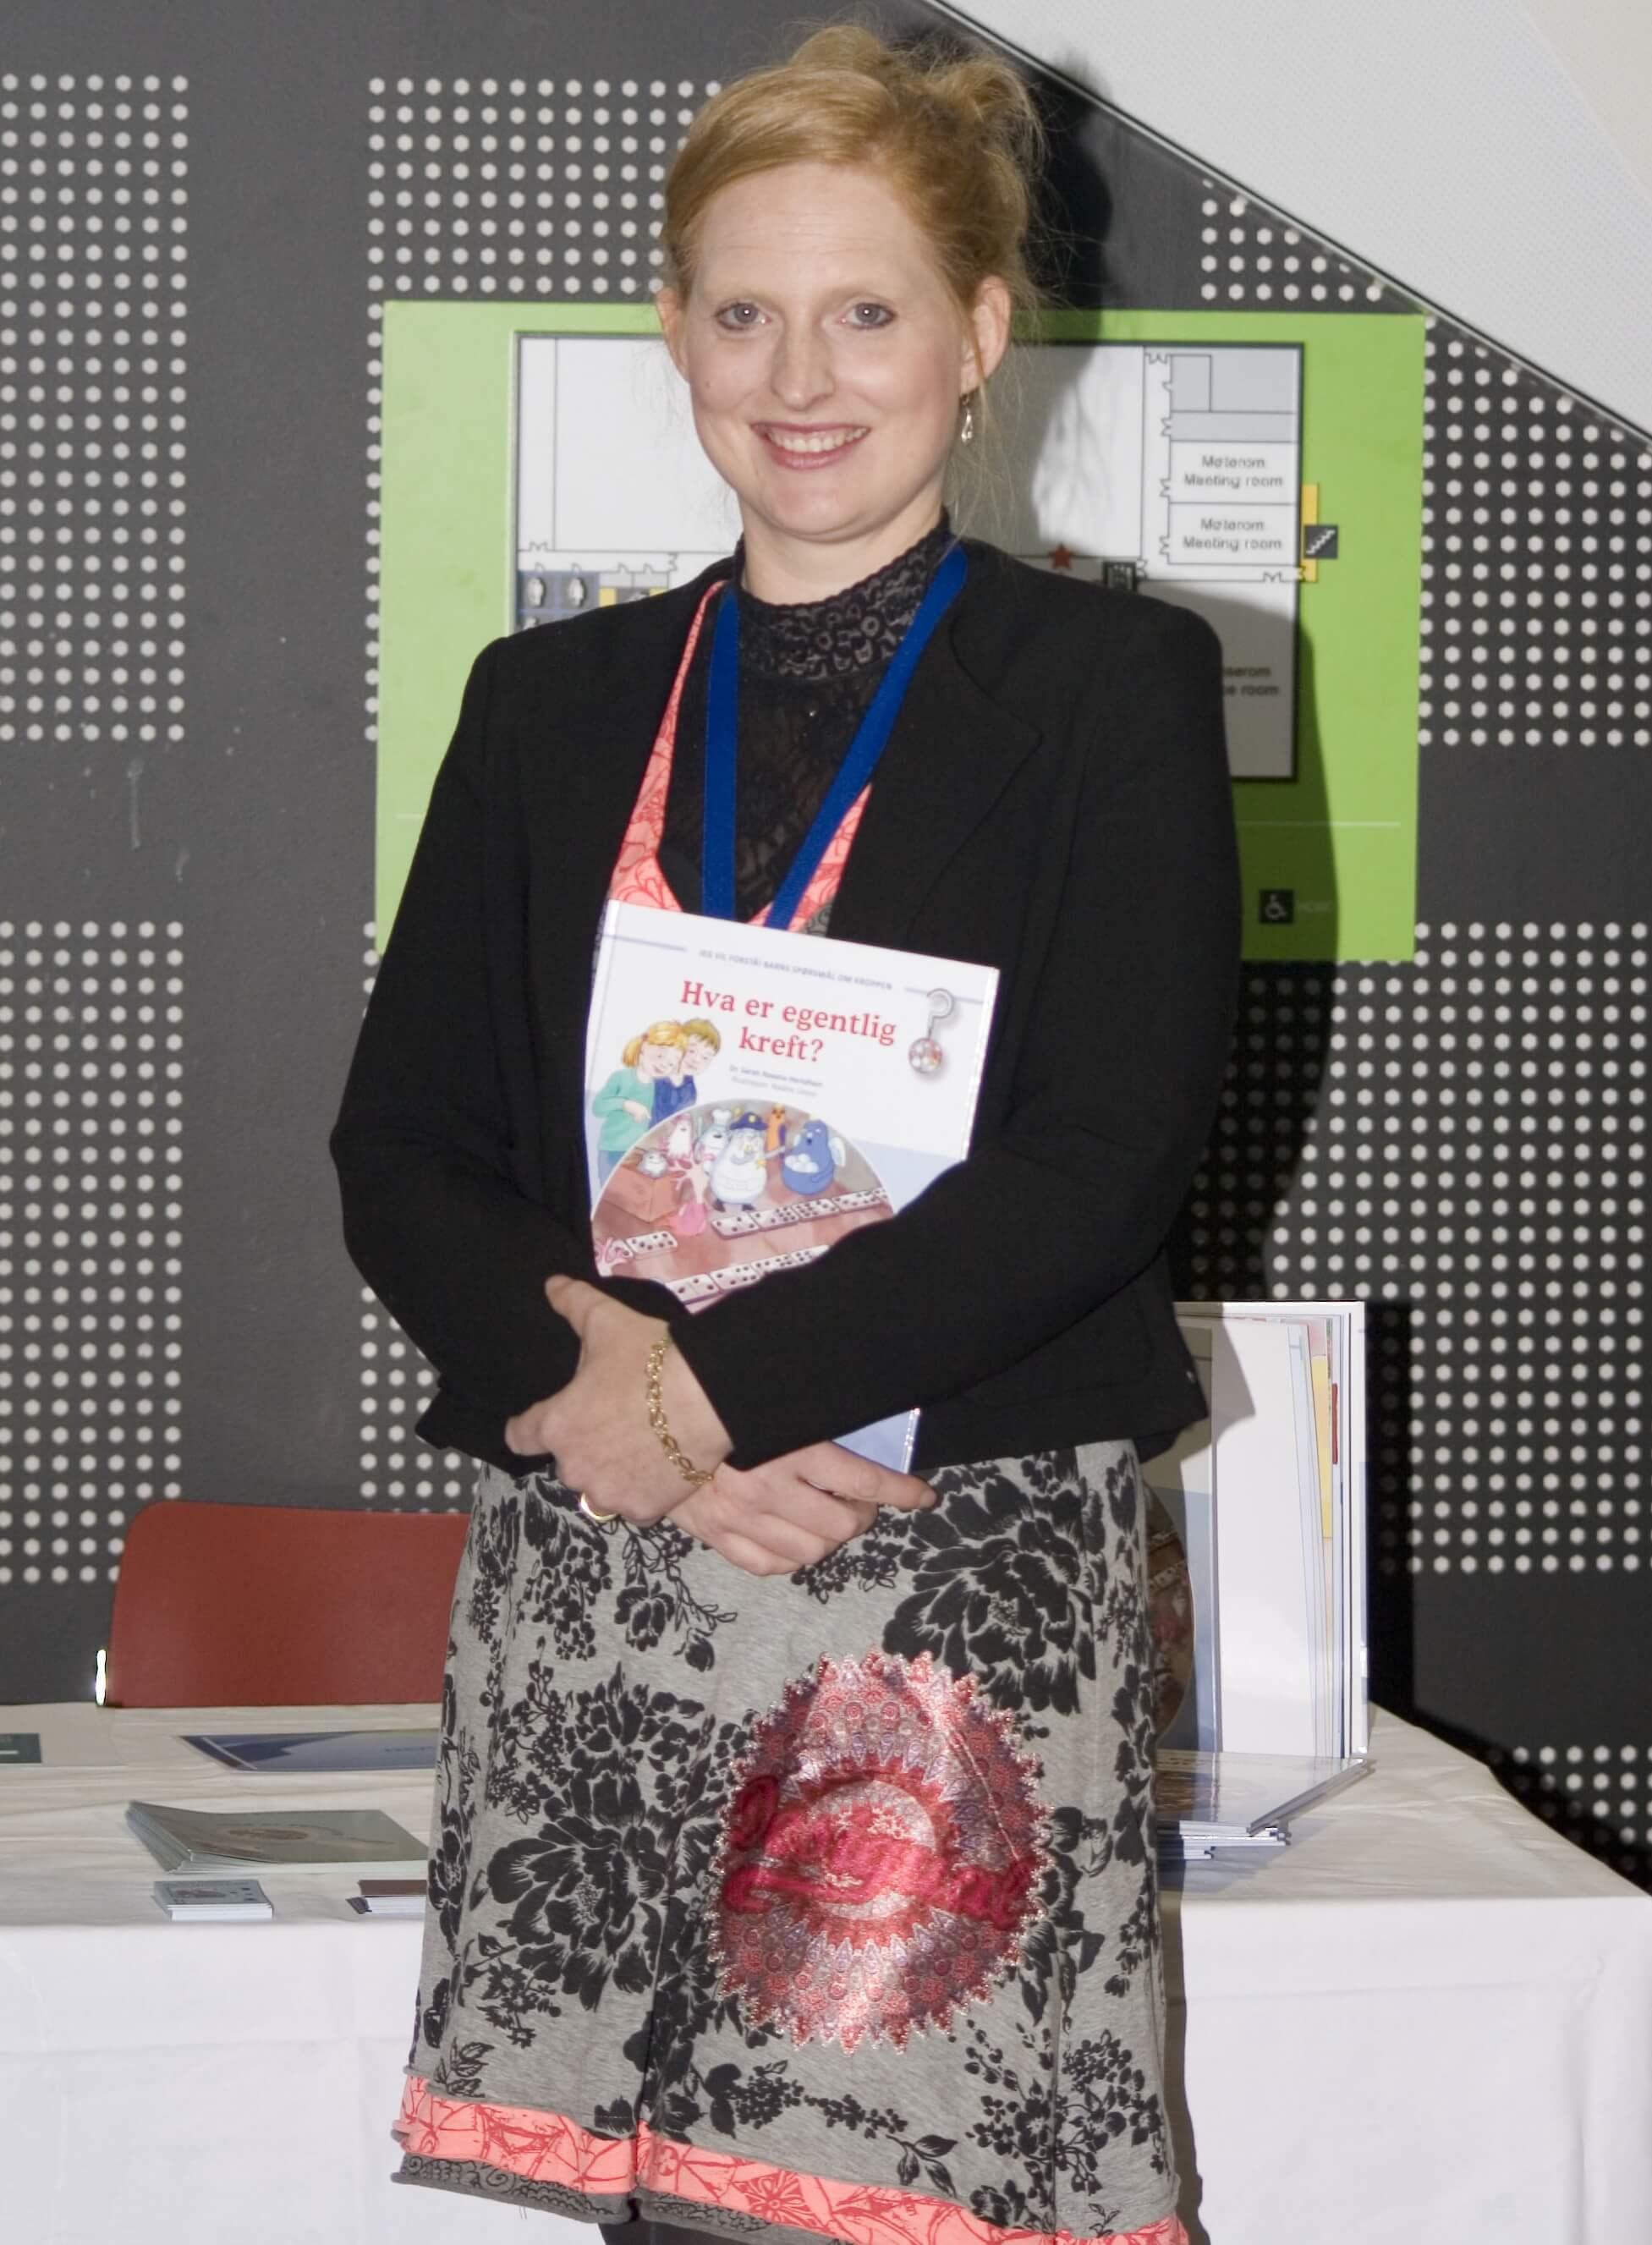 Sarah Herlofsen